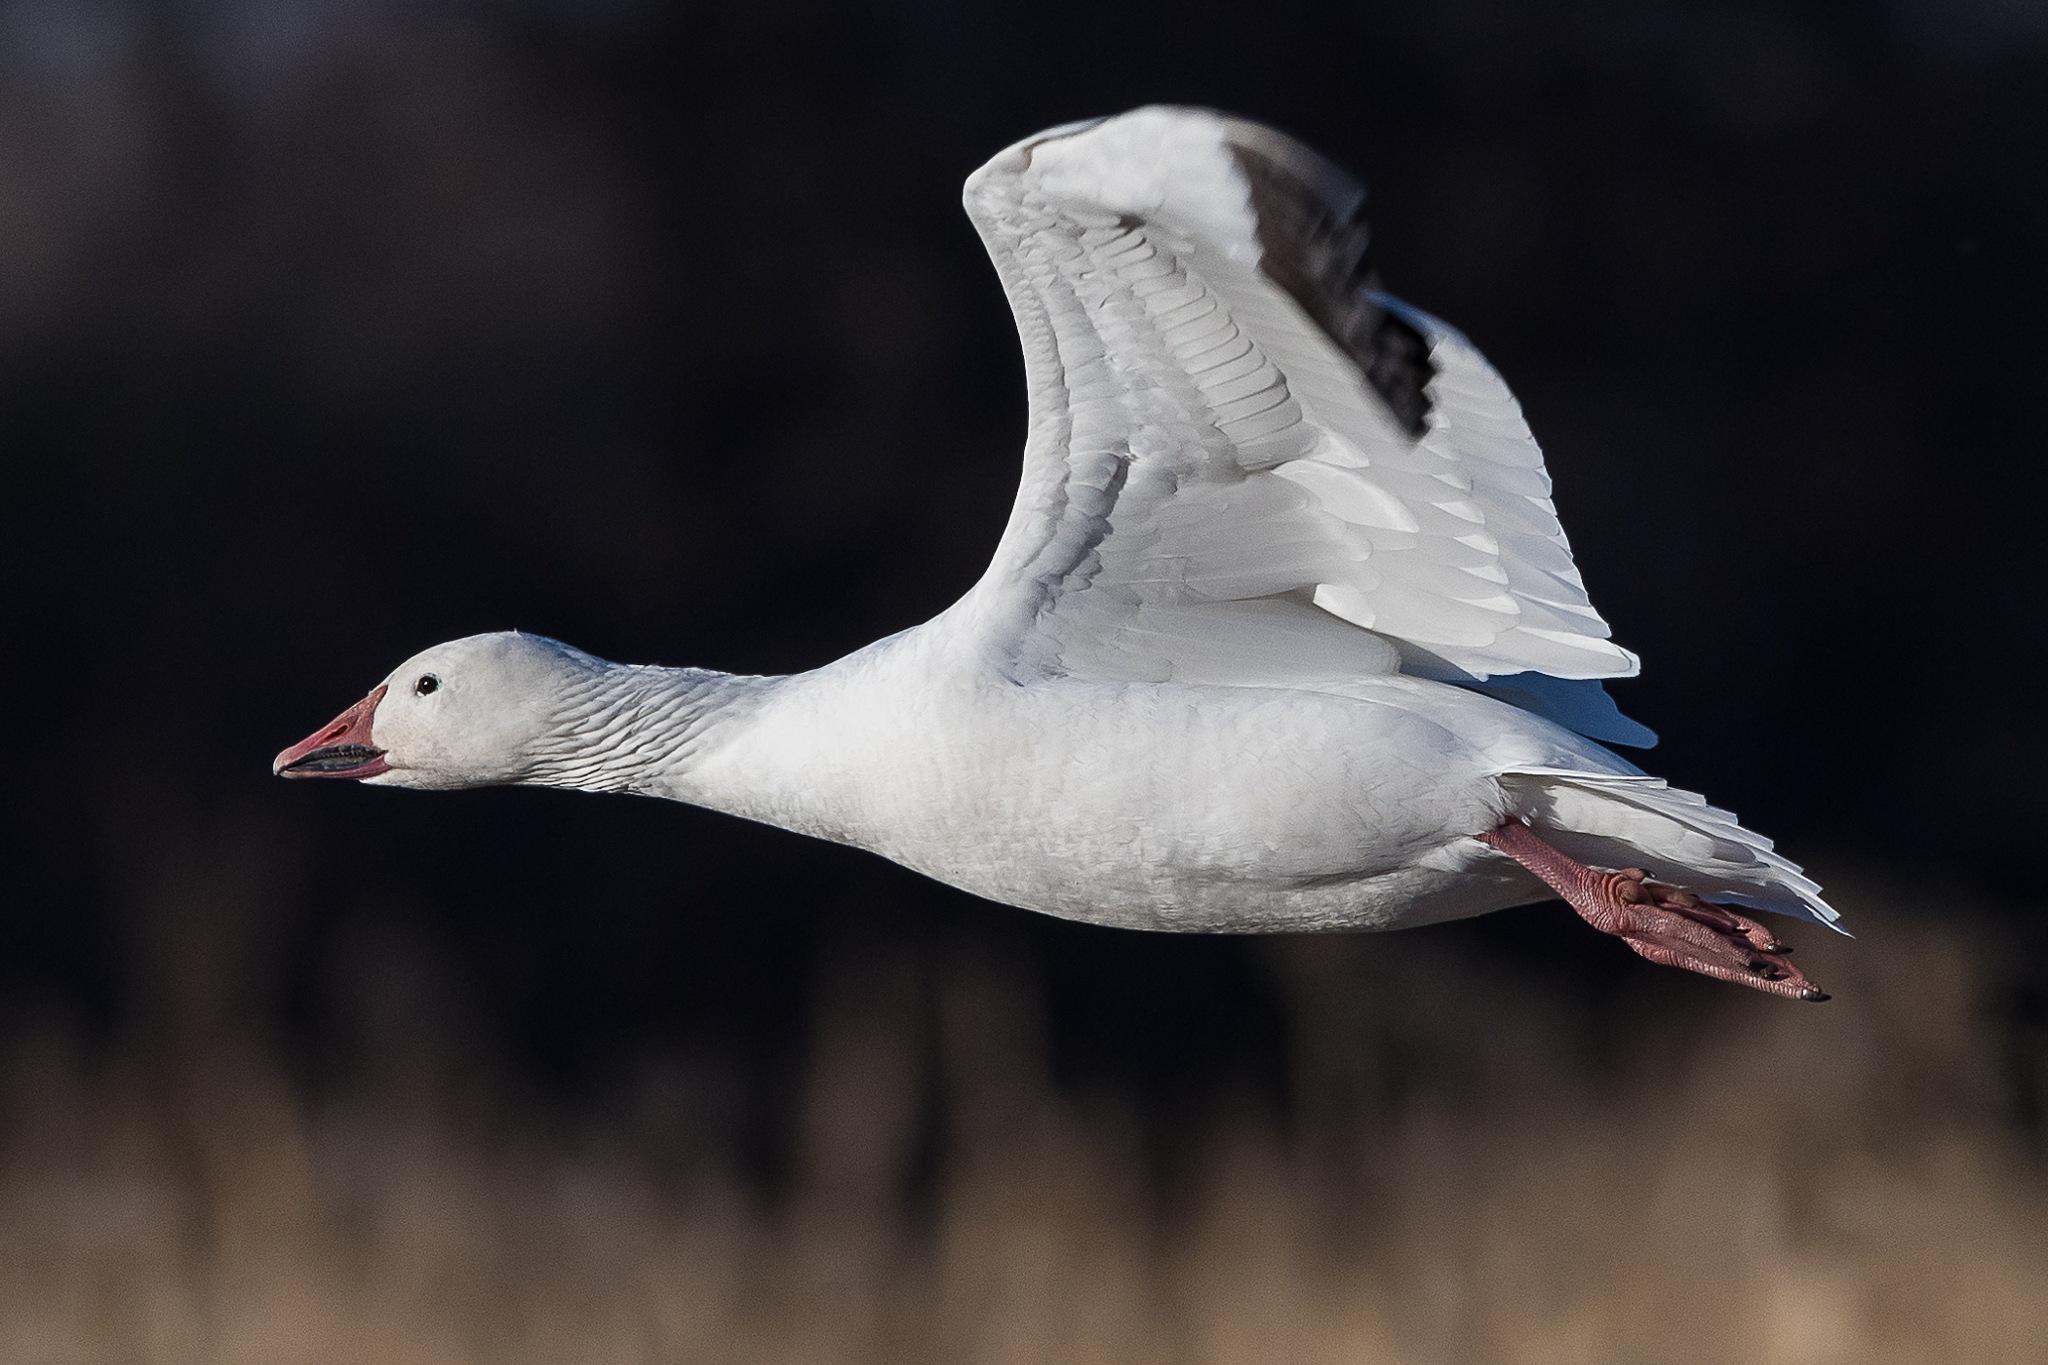 Snow Goose in Flight by Steve Aicinena